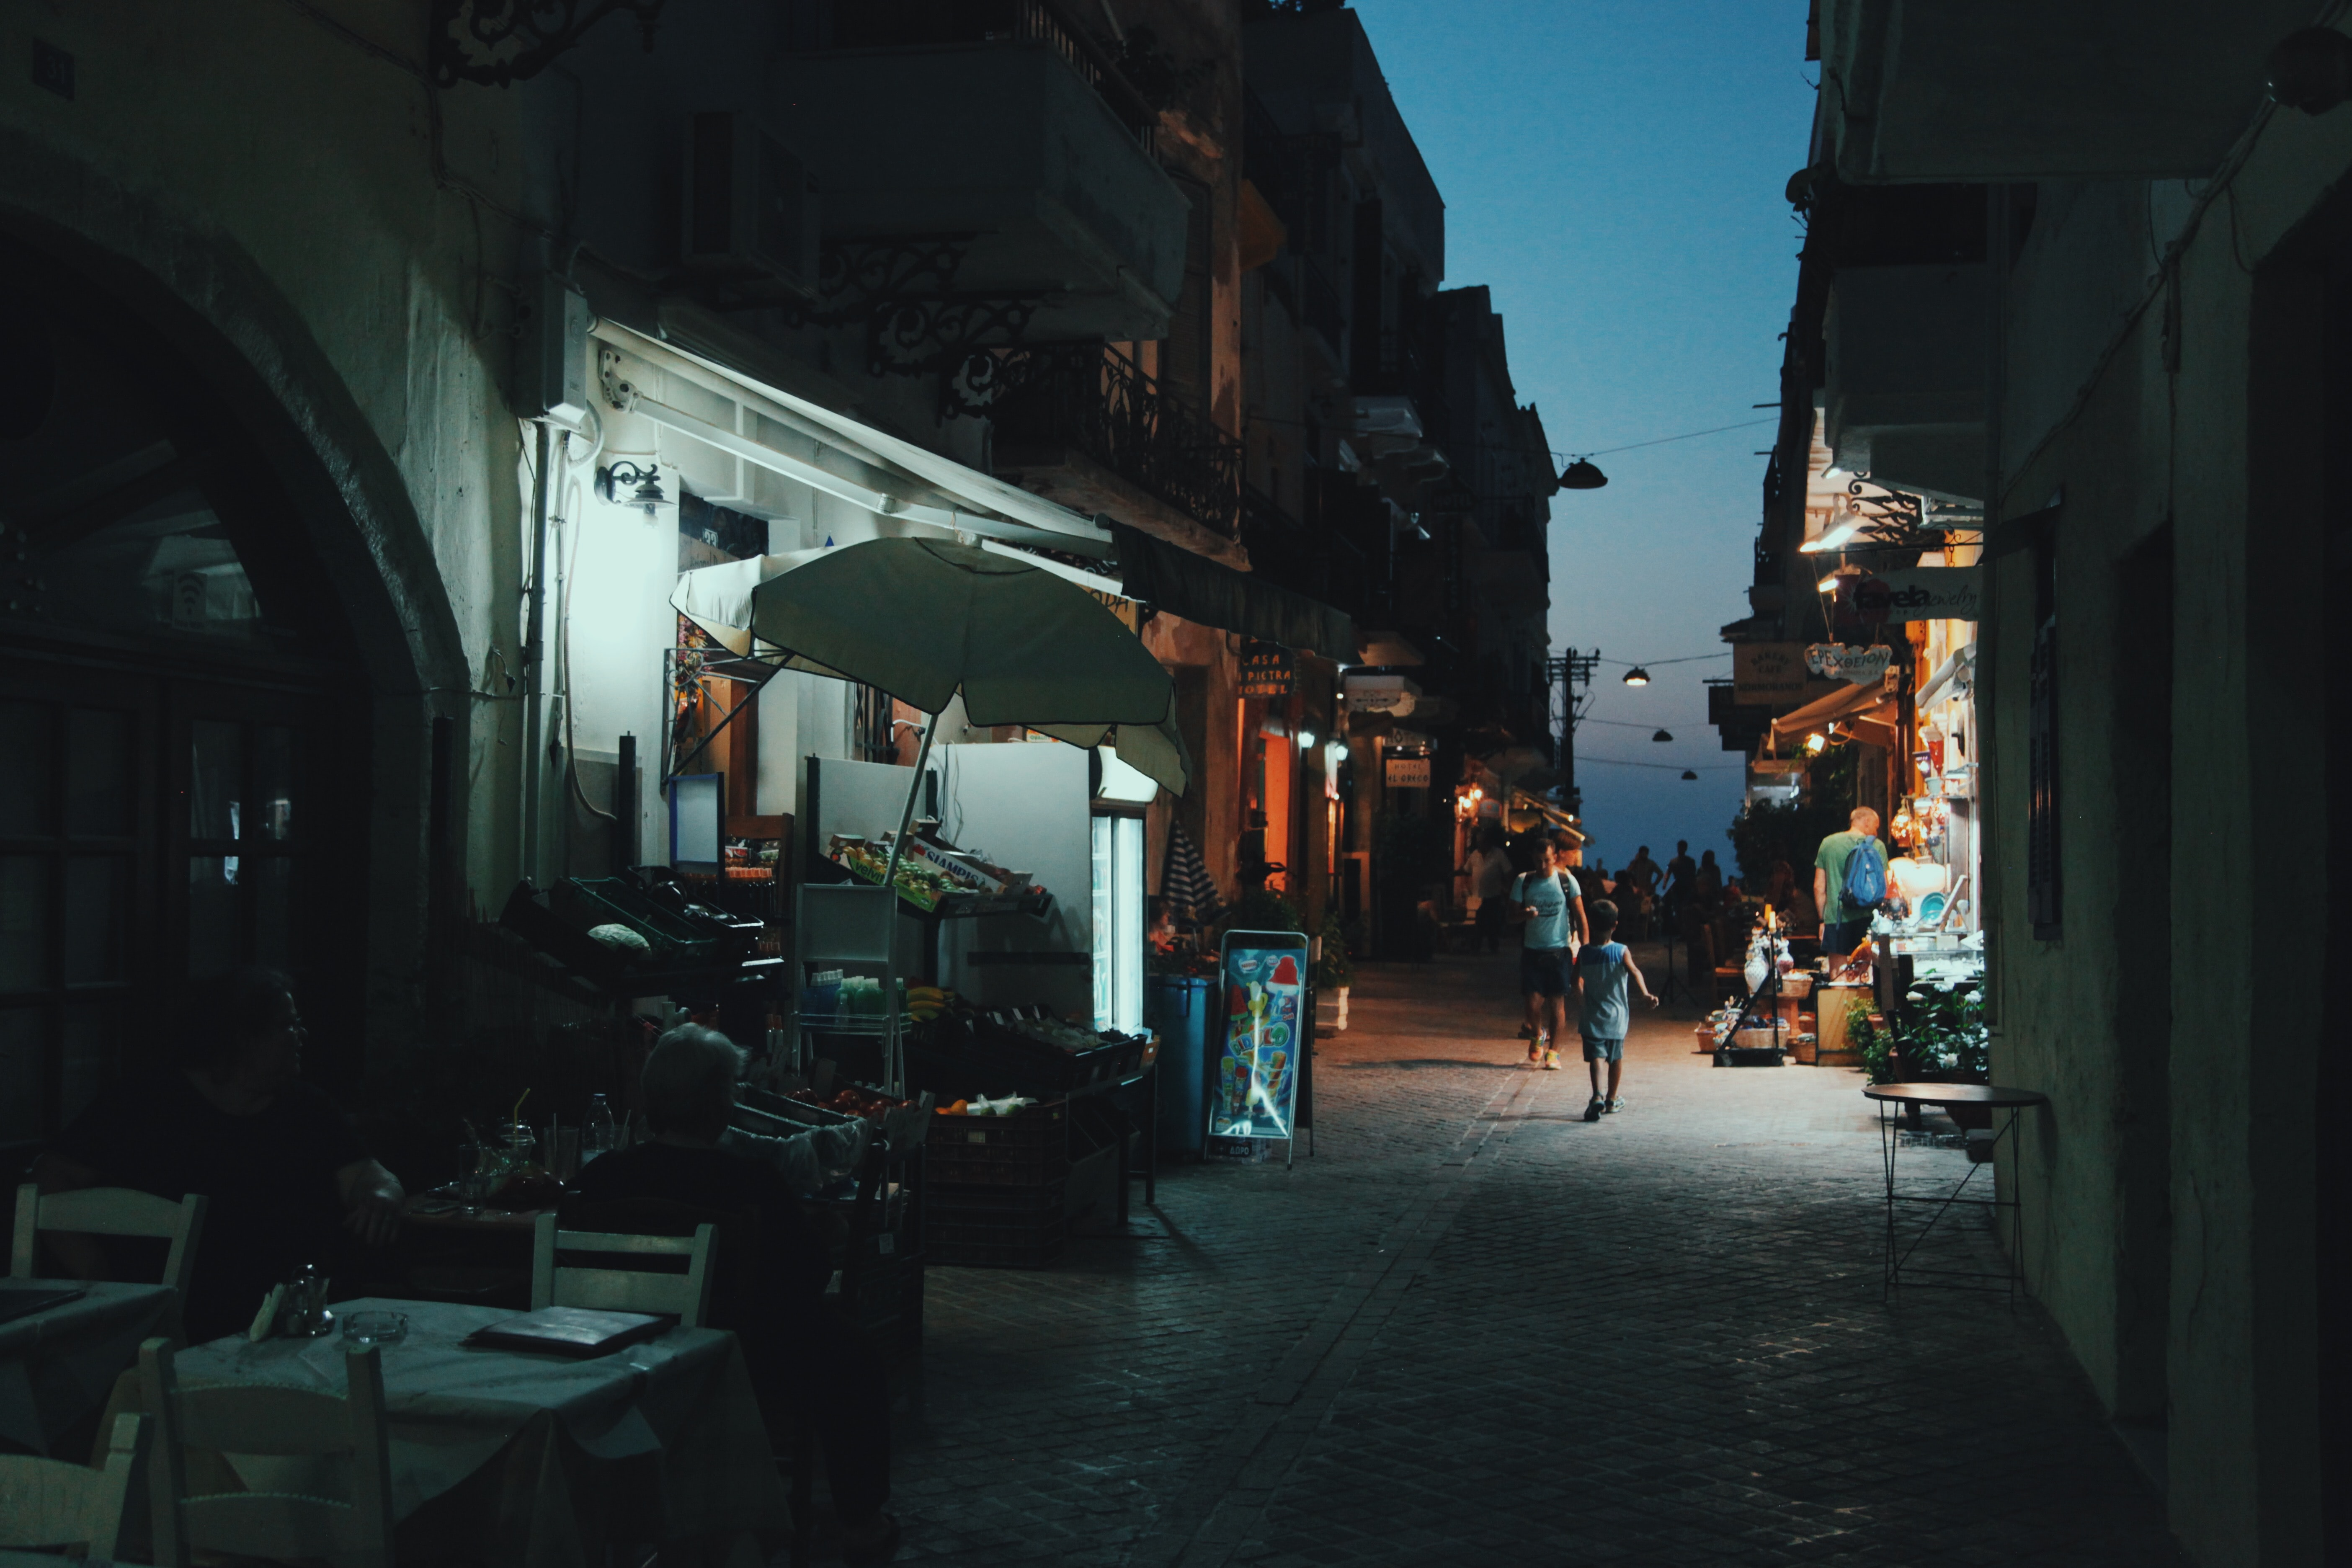 Chania, Greece, Vibrant Nightlife